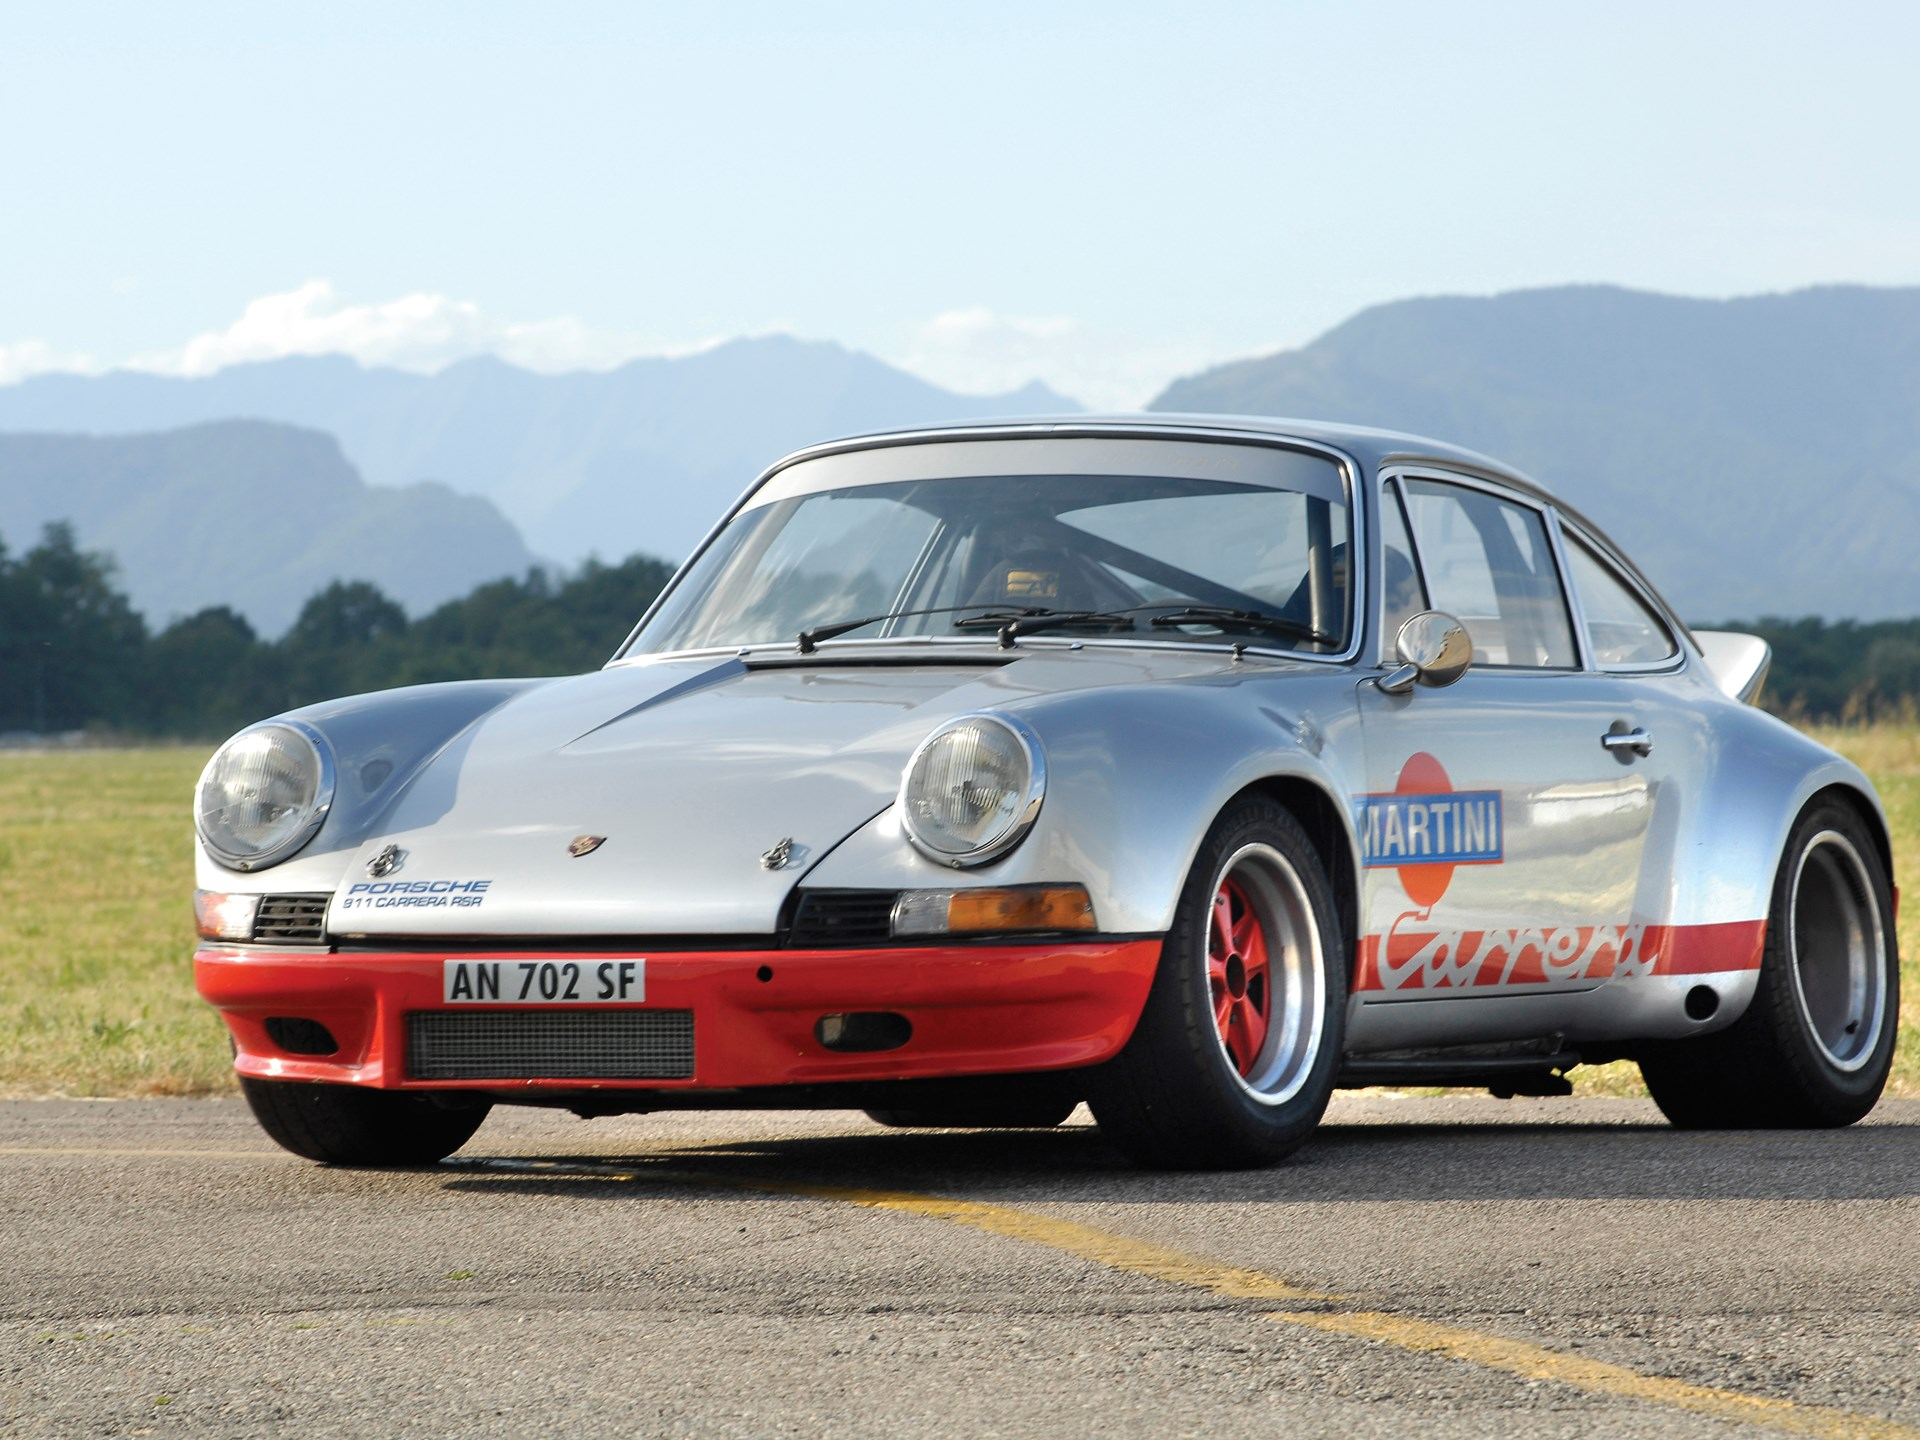 RM Sotheby's - 1973 Porsche 911 RSR 2.8 | Sporting Classics of ...